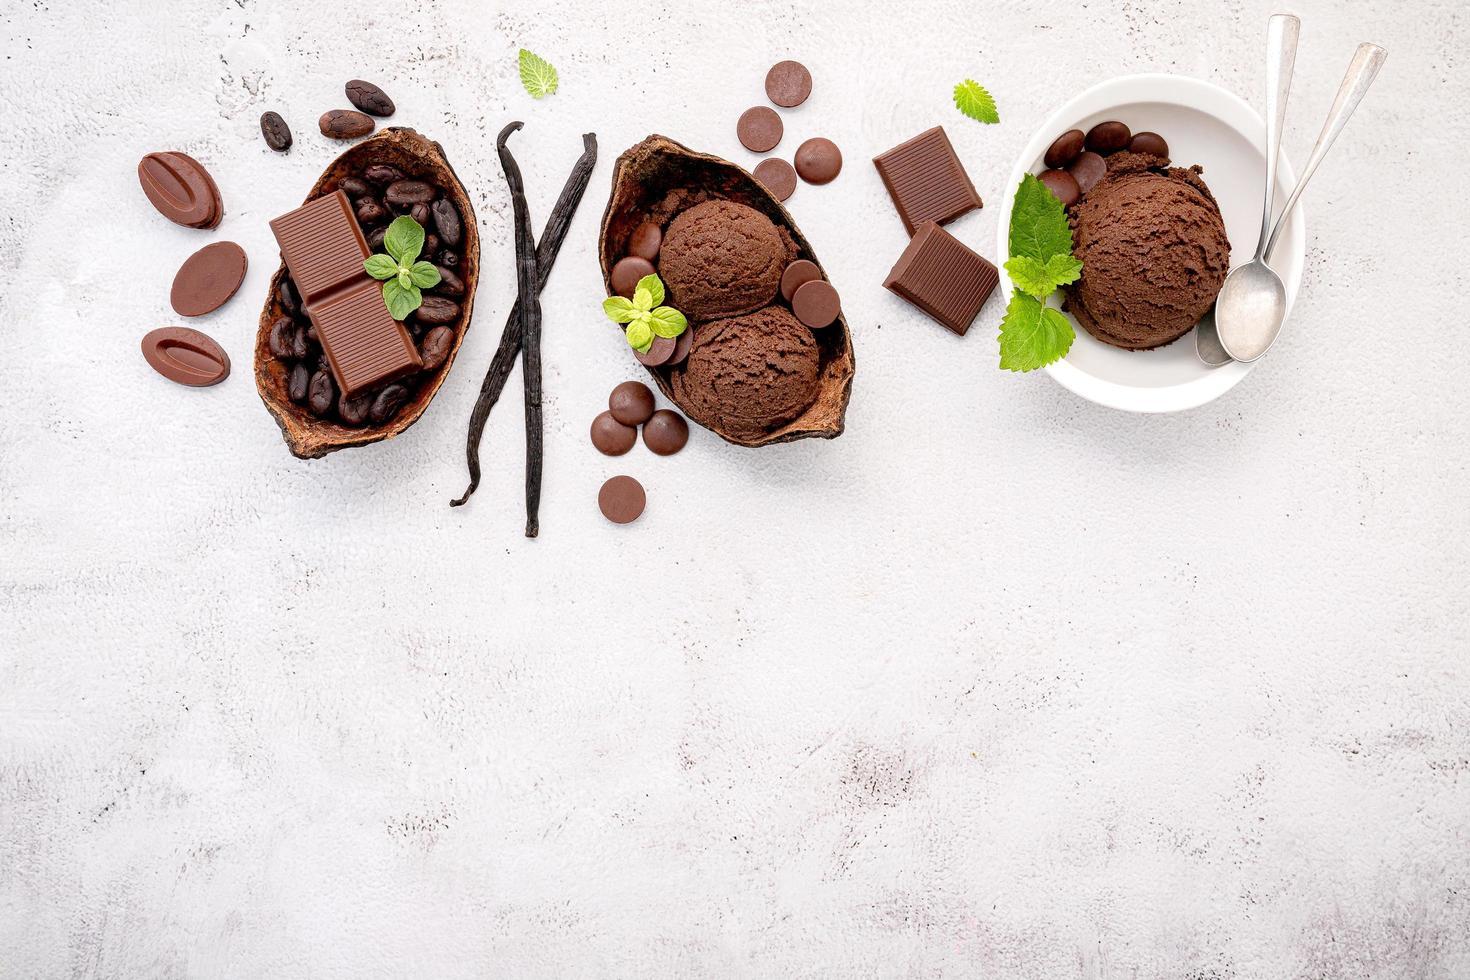 Schüsseln Schokoladeneis foto